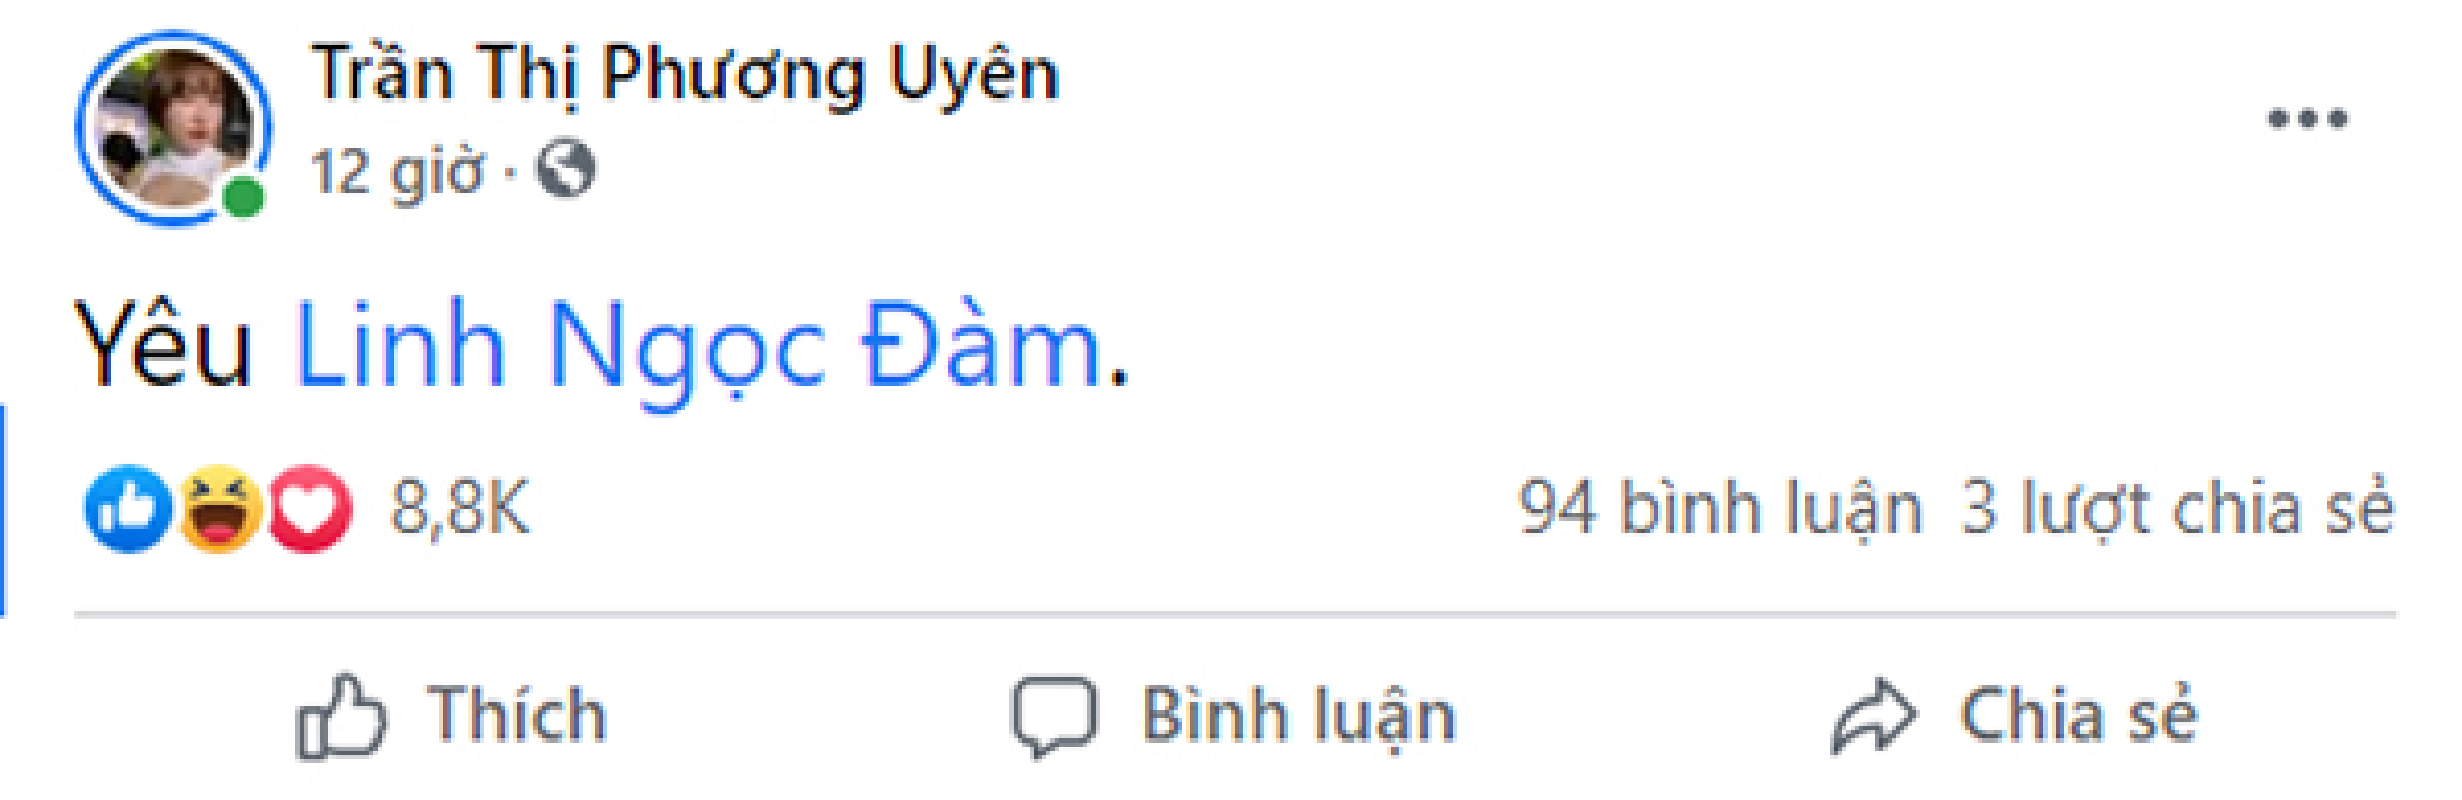 Linh Ngoc Dam nhan yeu thuong nhieu, khung bo cung lam-Hinh-5